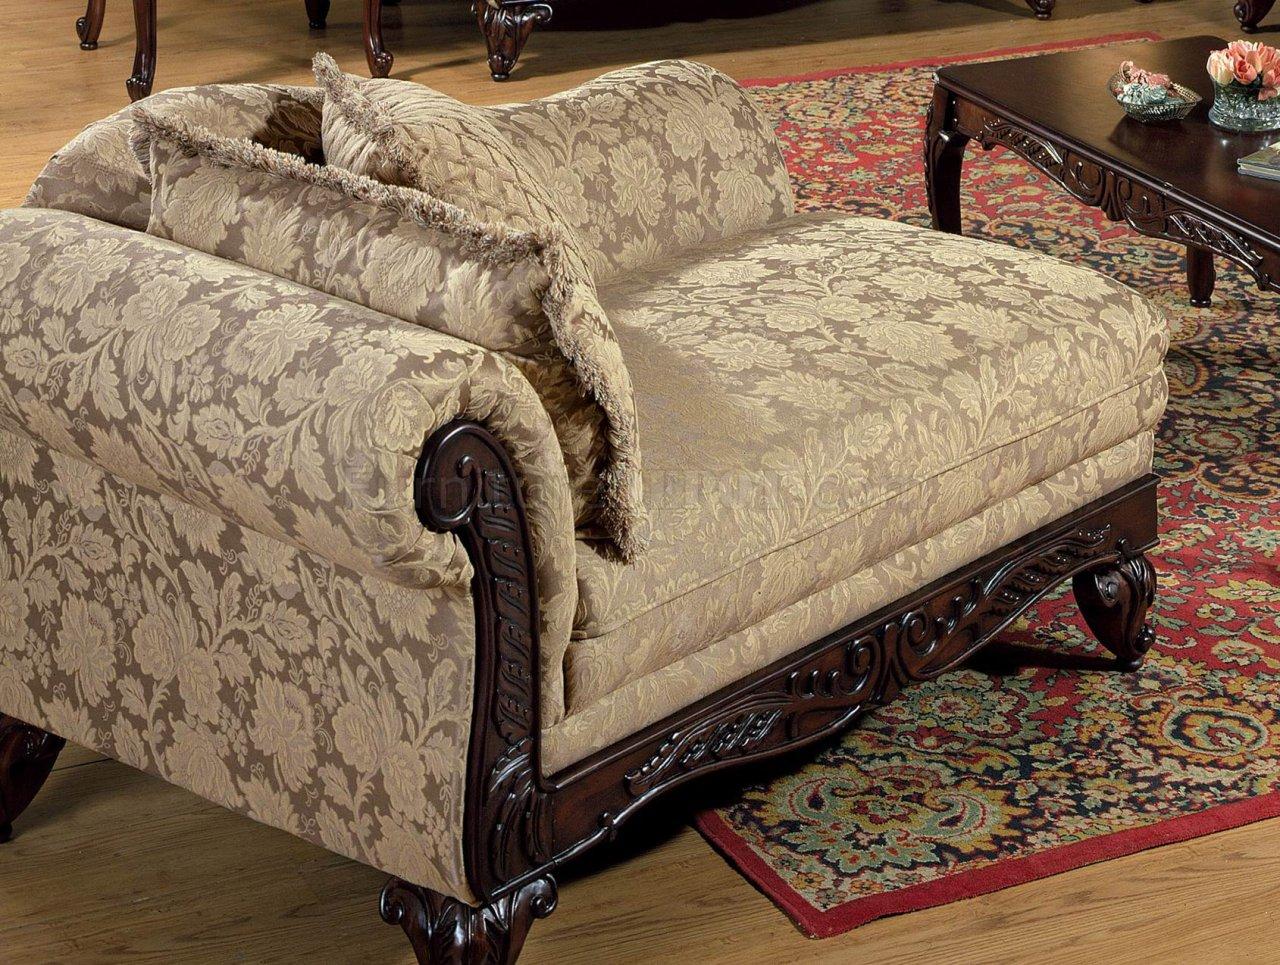 Stupendous Beige Clarissa Carmel Fabric Traditional 2Pc Sofa Set W Options Theyellowbook Wood Chair Design Ideas Theyellowbookinfo